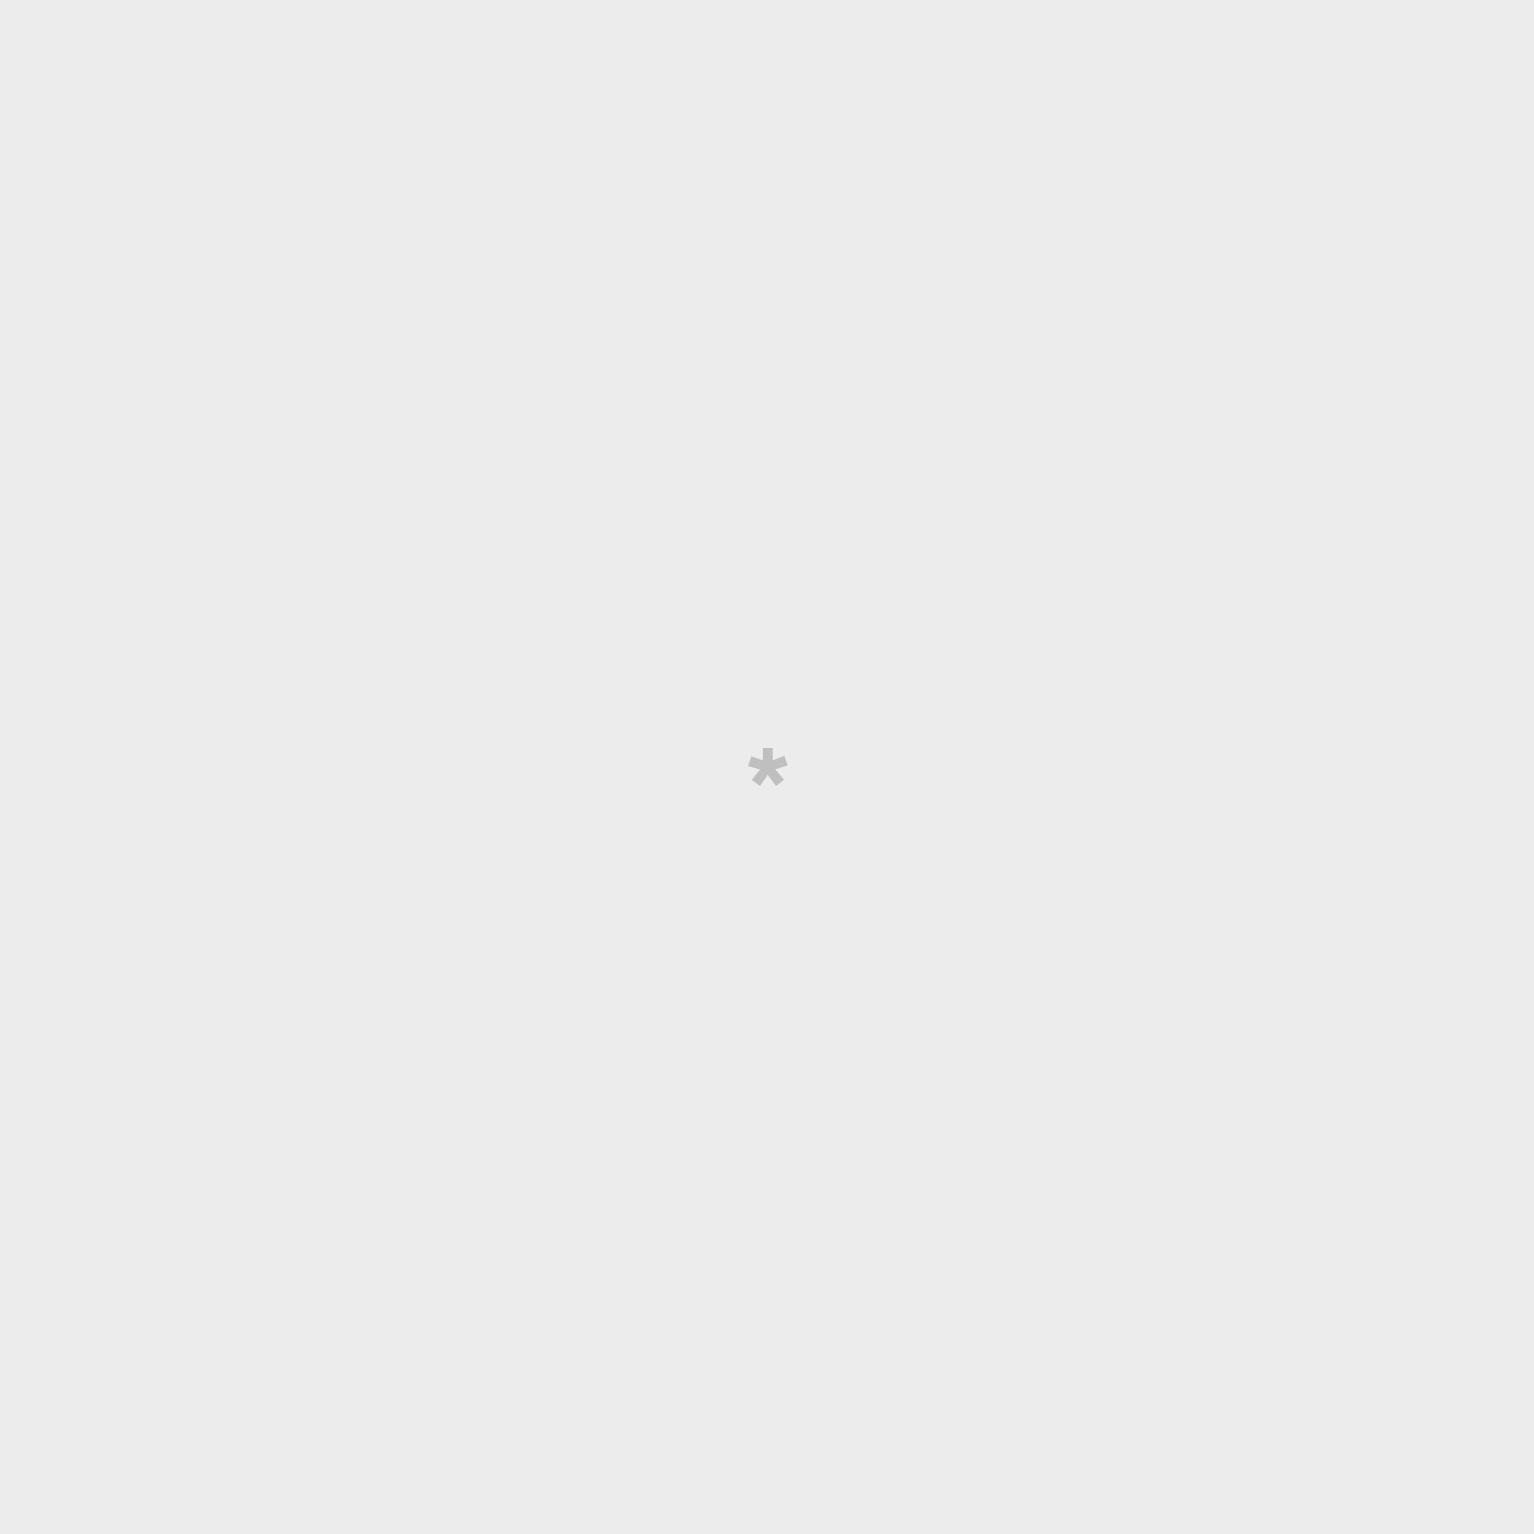 Bracelet ajustable - idée cadeau maman